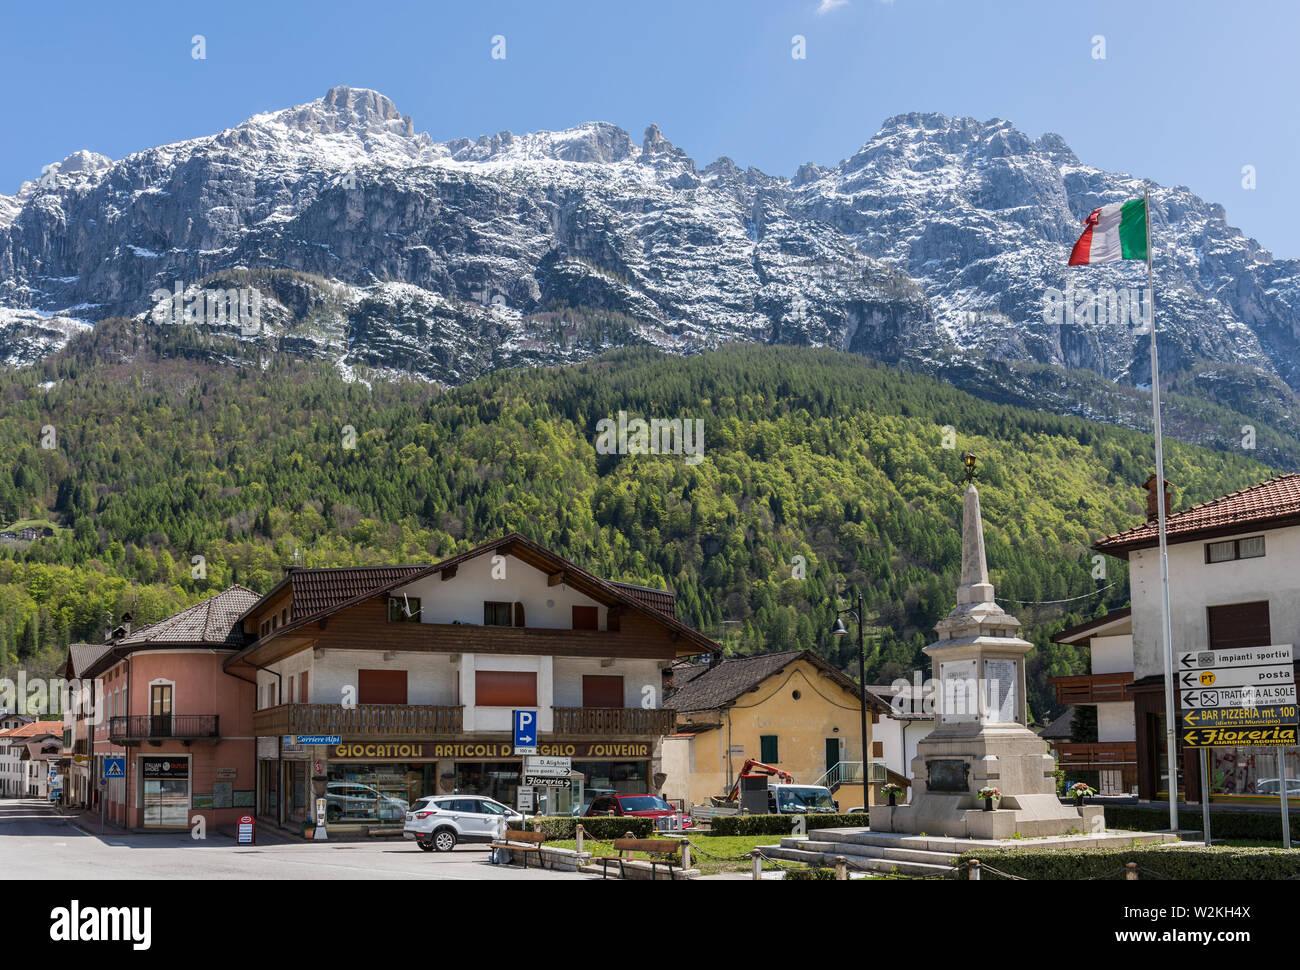 Cencenighe Agordino, Dolomites, Italie Banque D'Images